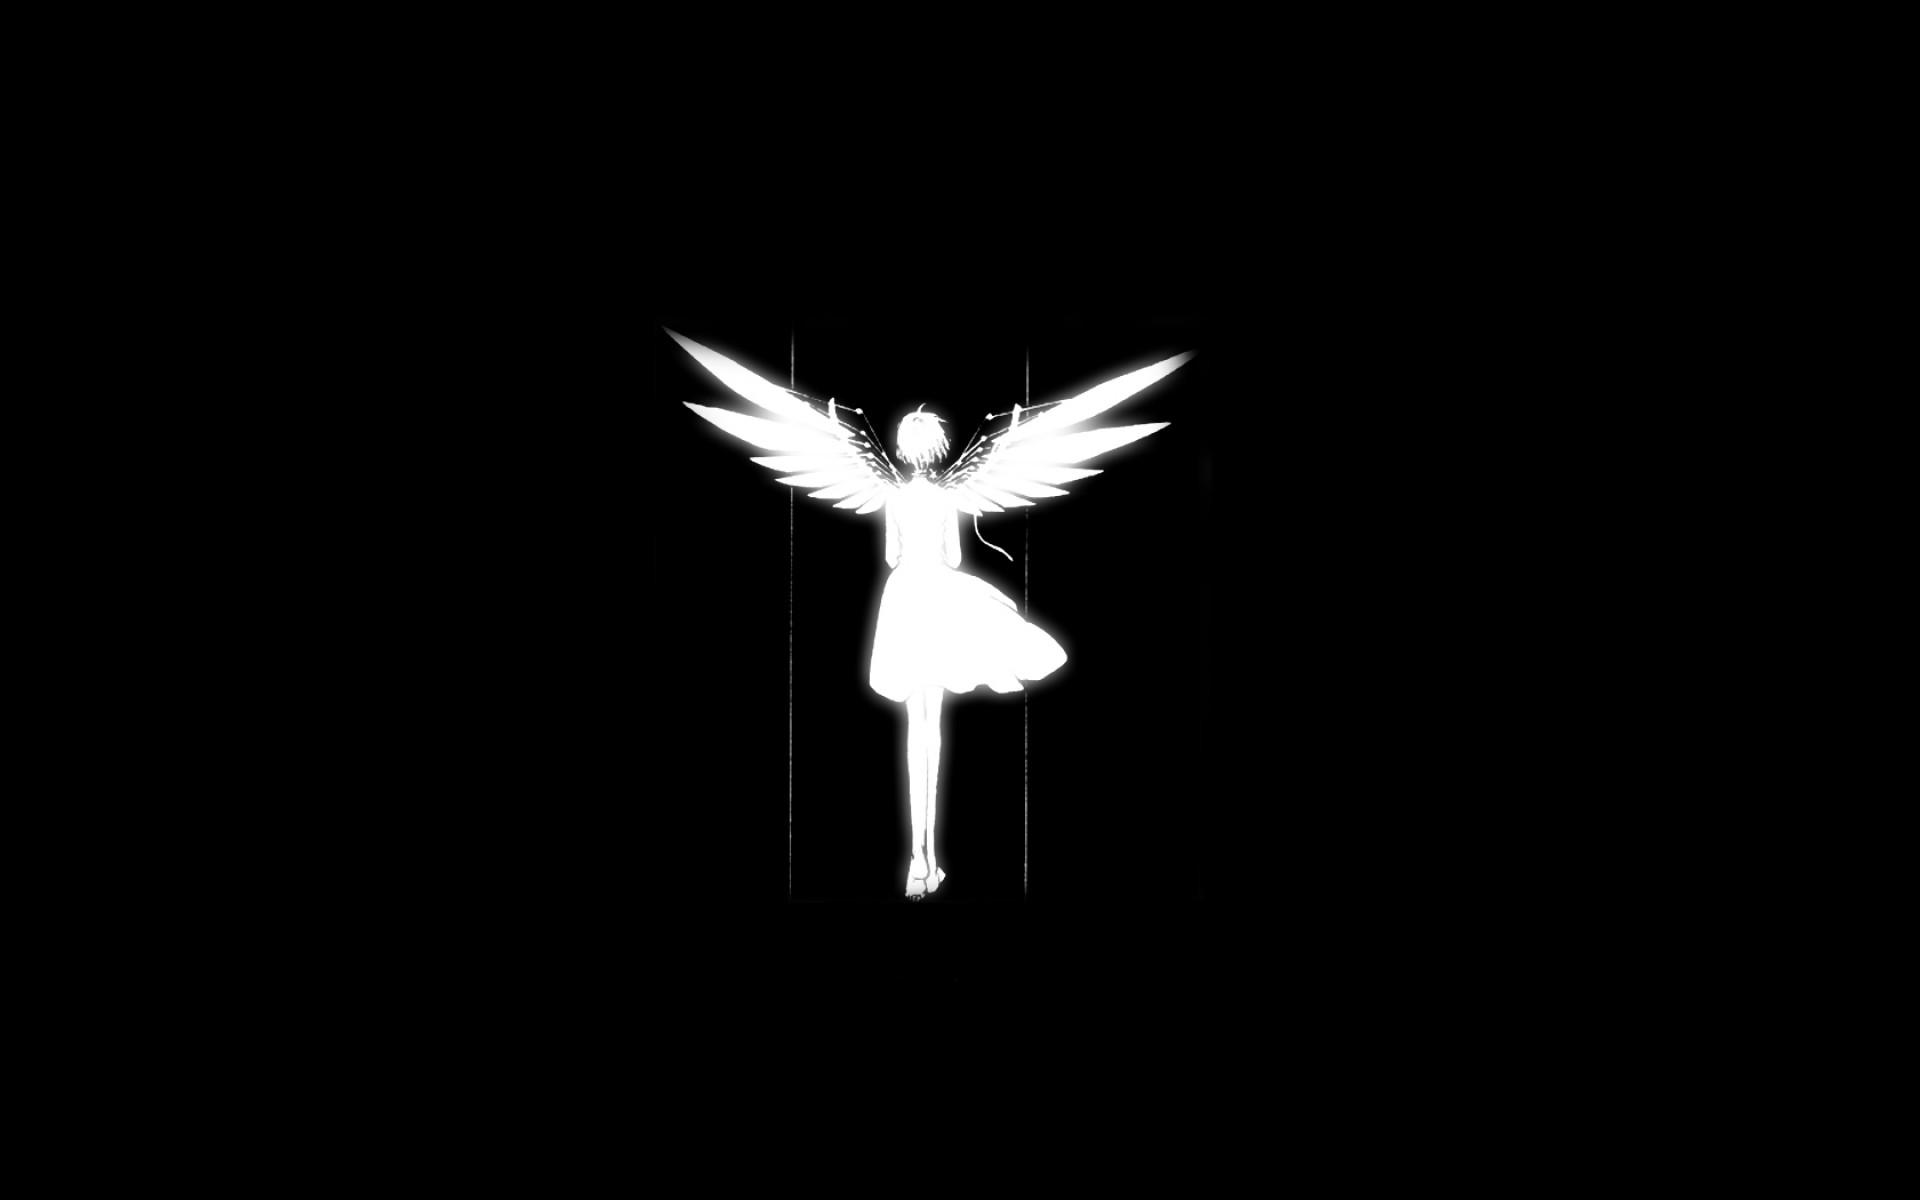 … Silhouette Angel Wings Black Background 1680X1050 Wallpaper  …